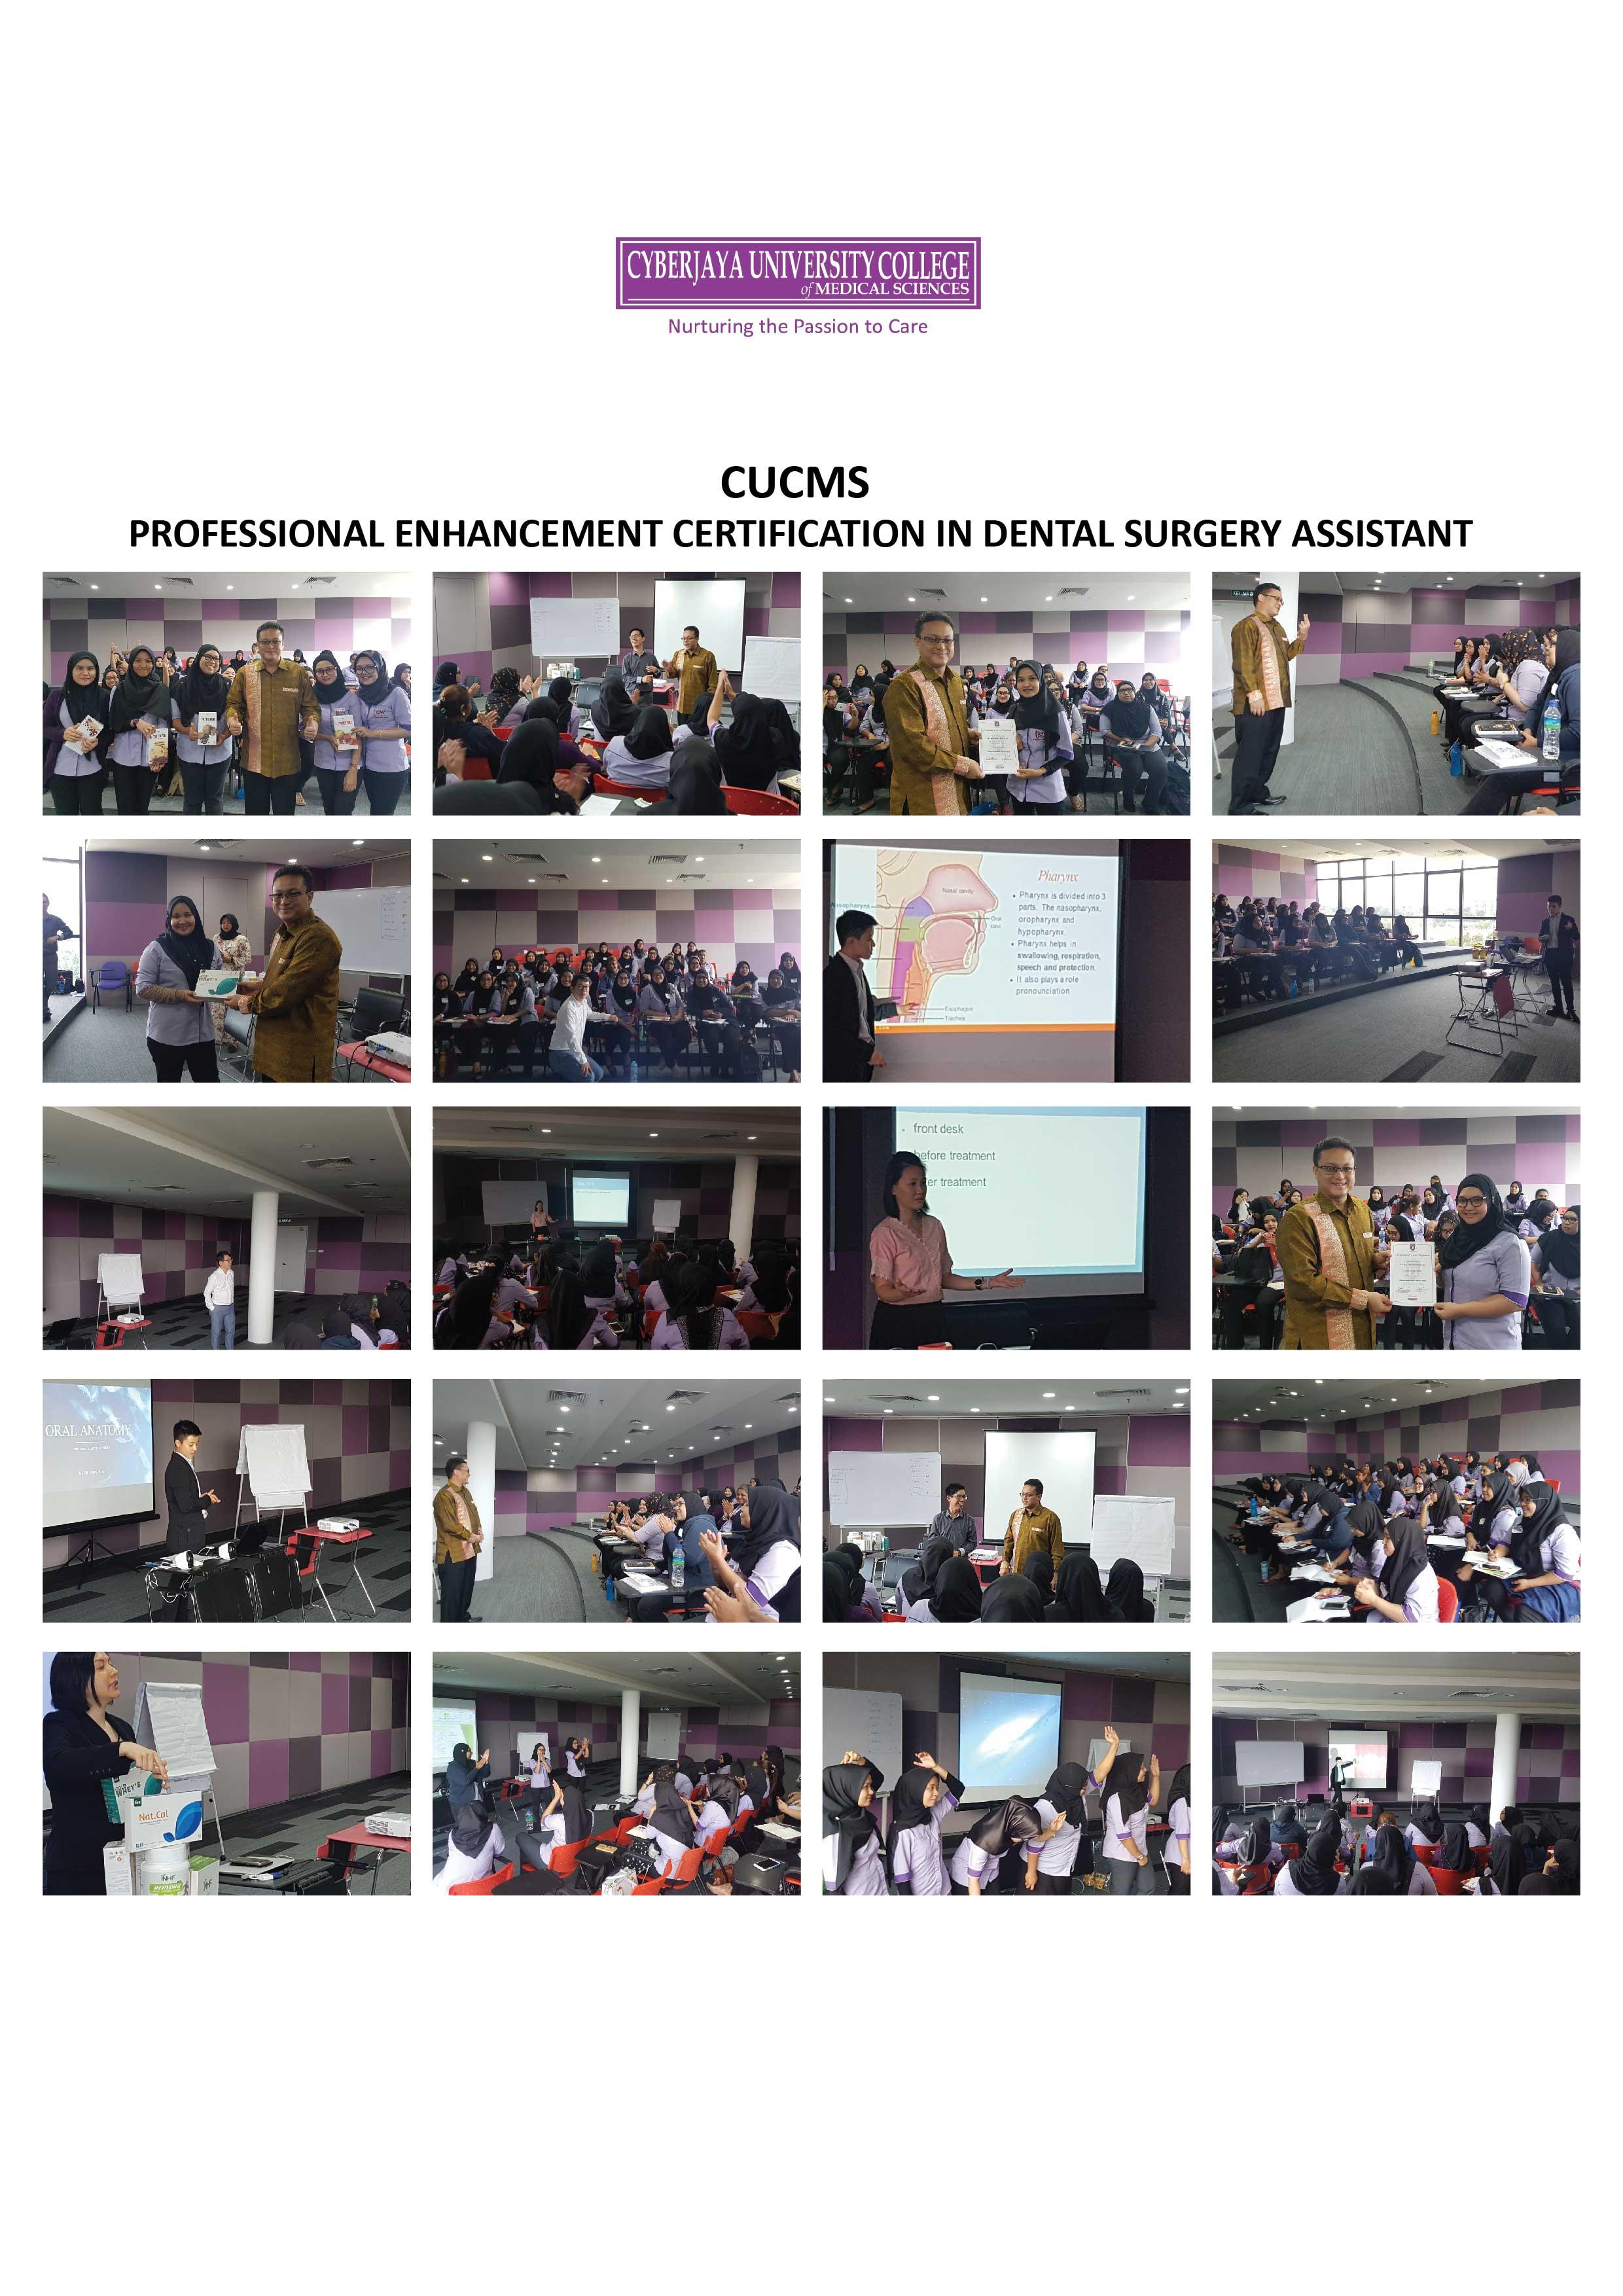 CUCMS PROFESSIONAL ENHANCEMENT CERTIFICATION IN DENTAL SURGERY ASSISTANT